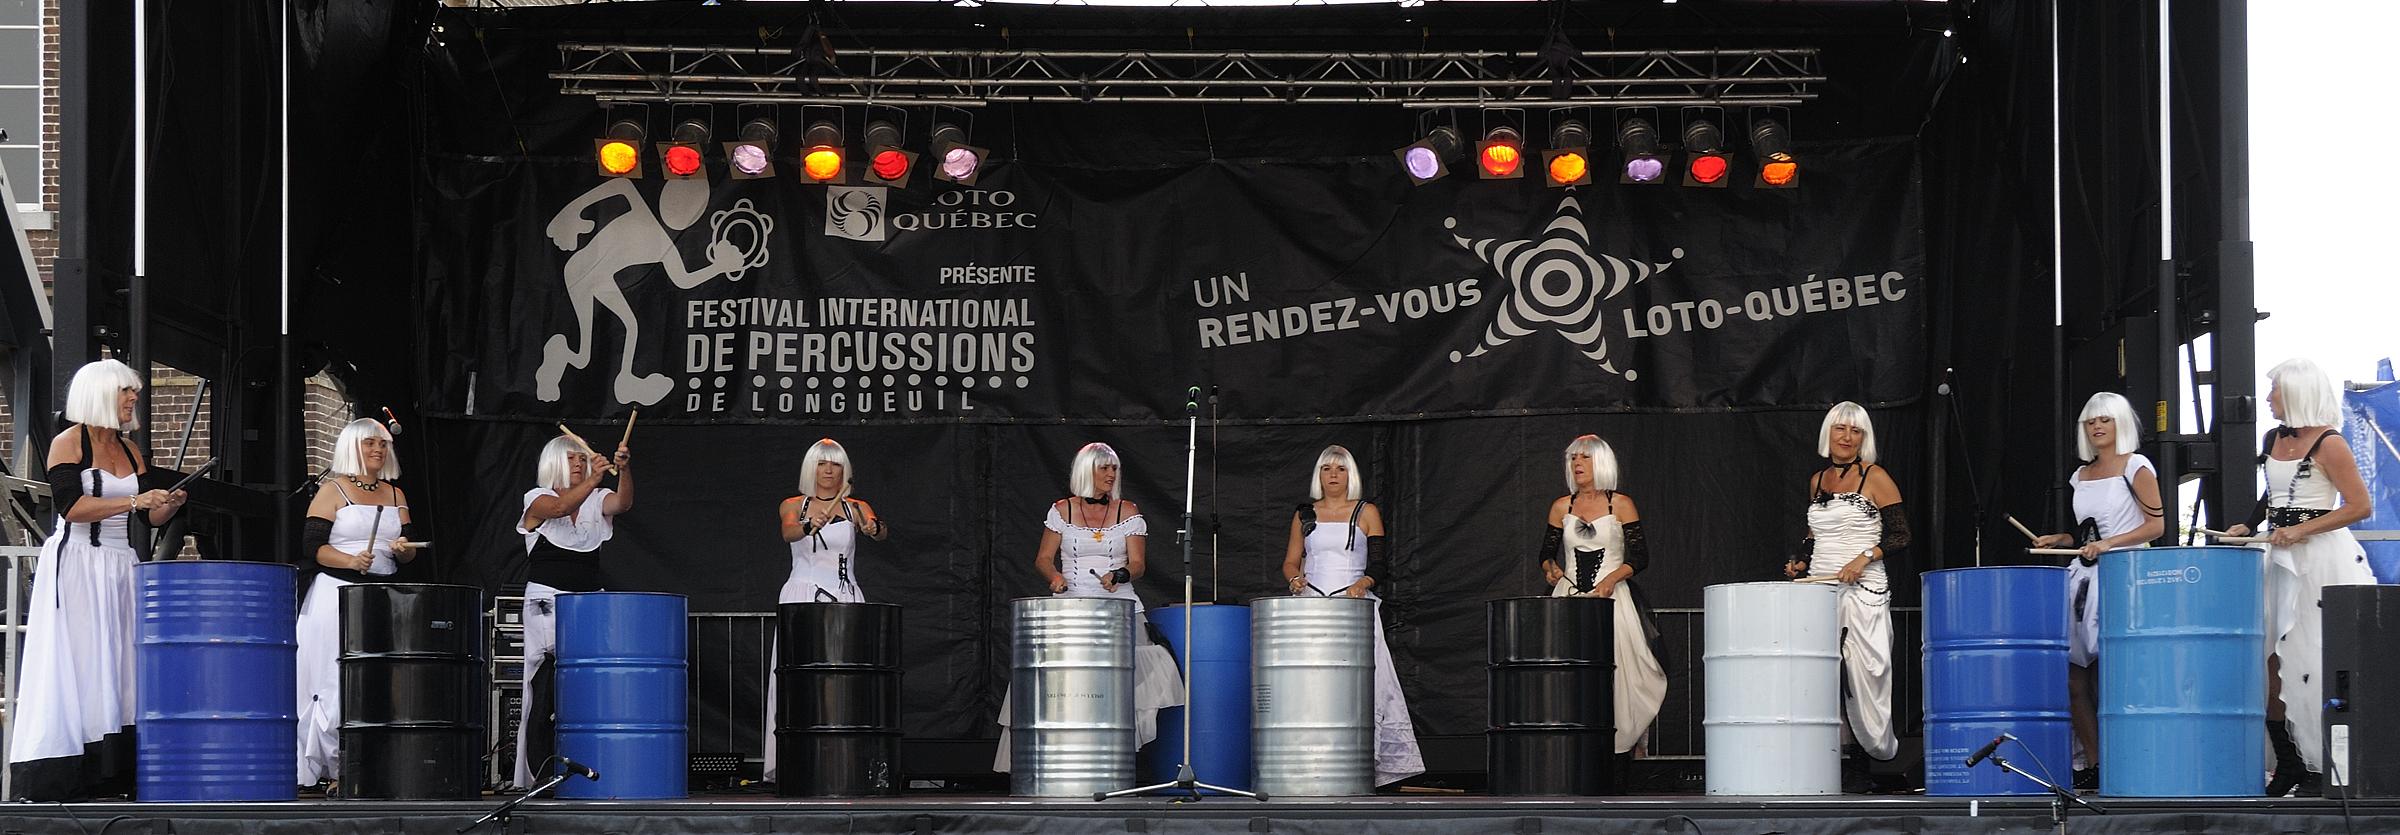 Festival international de percussion de Longueuil ( FIPL ), Longueuil, Qc; Uppercut, groupe féminin de percussion français, dans le cadre du FIPL, / Uppercut, a french group of percussion composed only of women, performing at the FIPL.